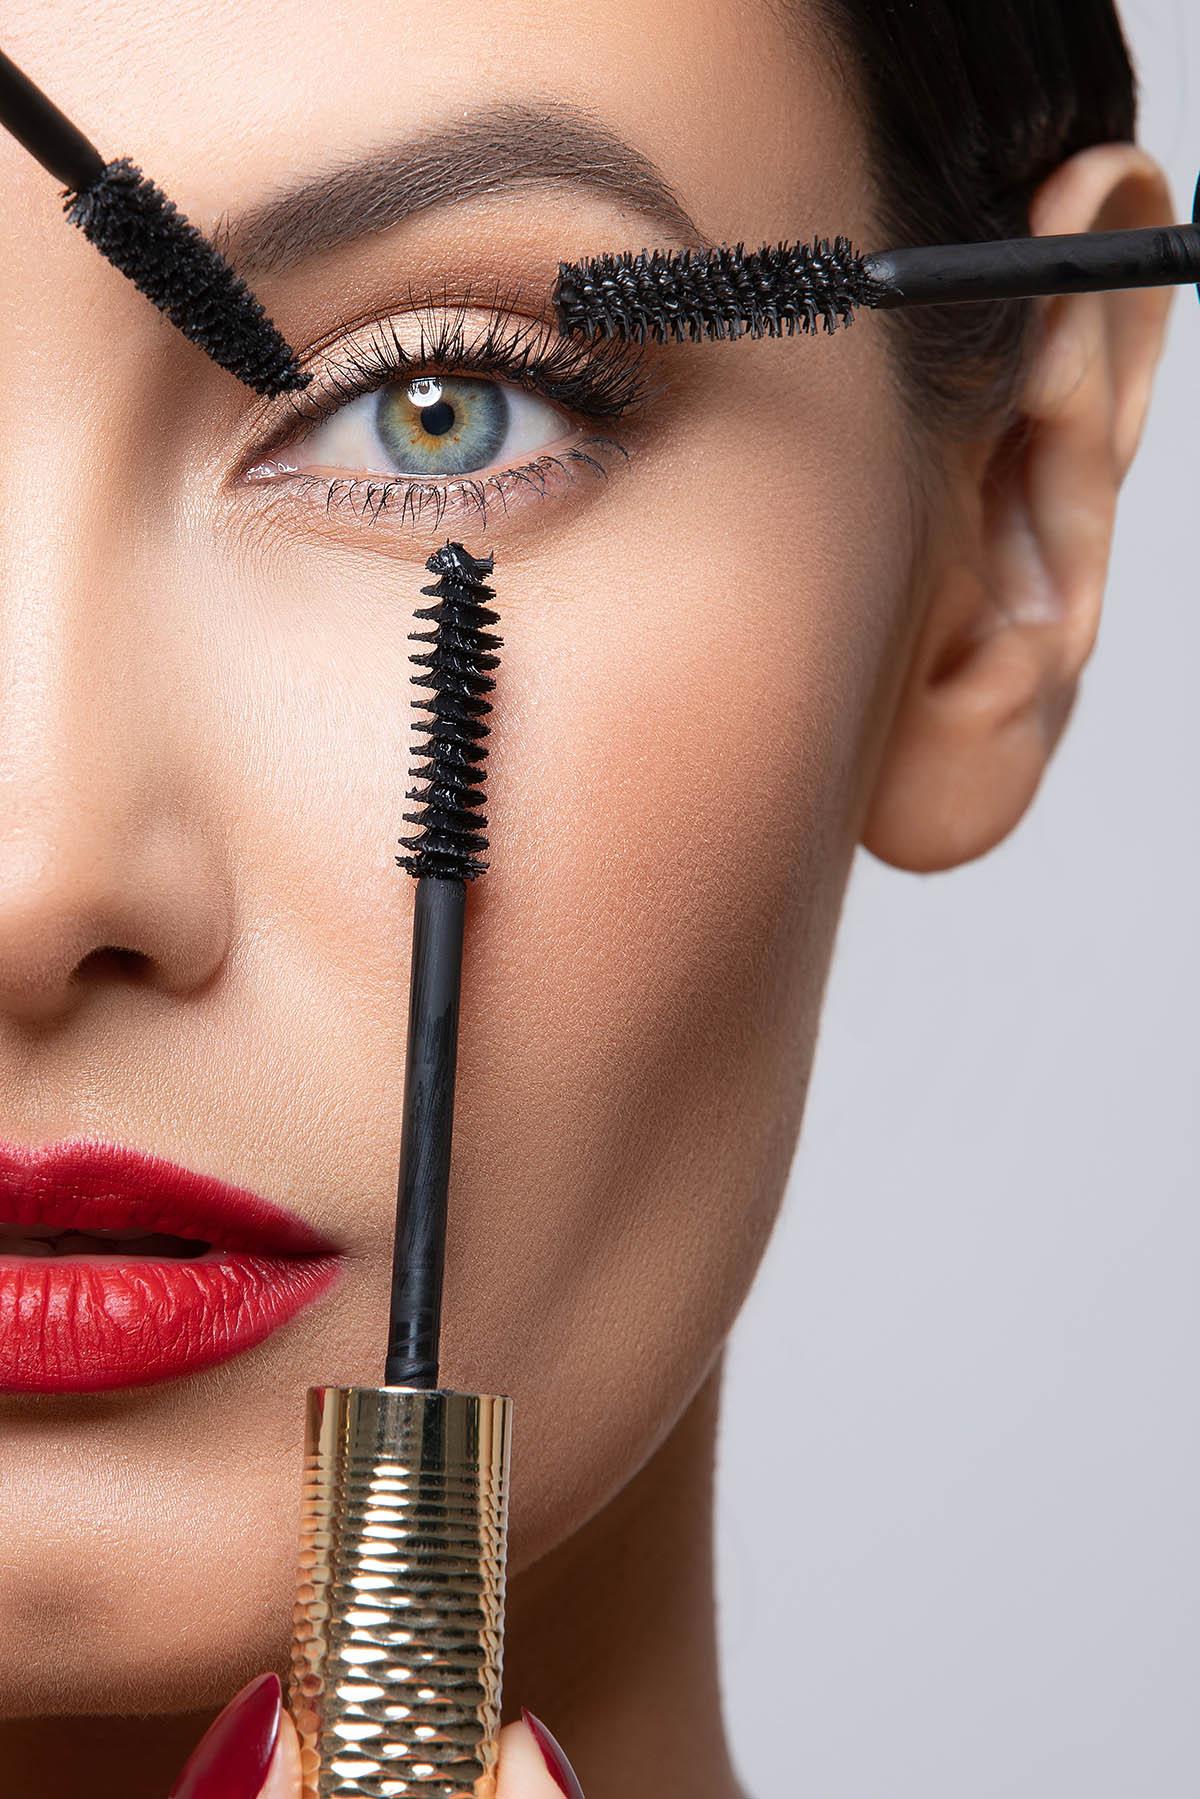 Commercial beauty portrait by Loesje Kessels Fashion Photographer Dubai